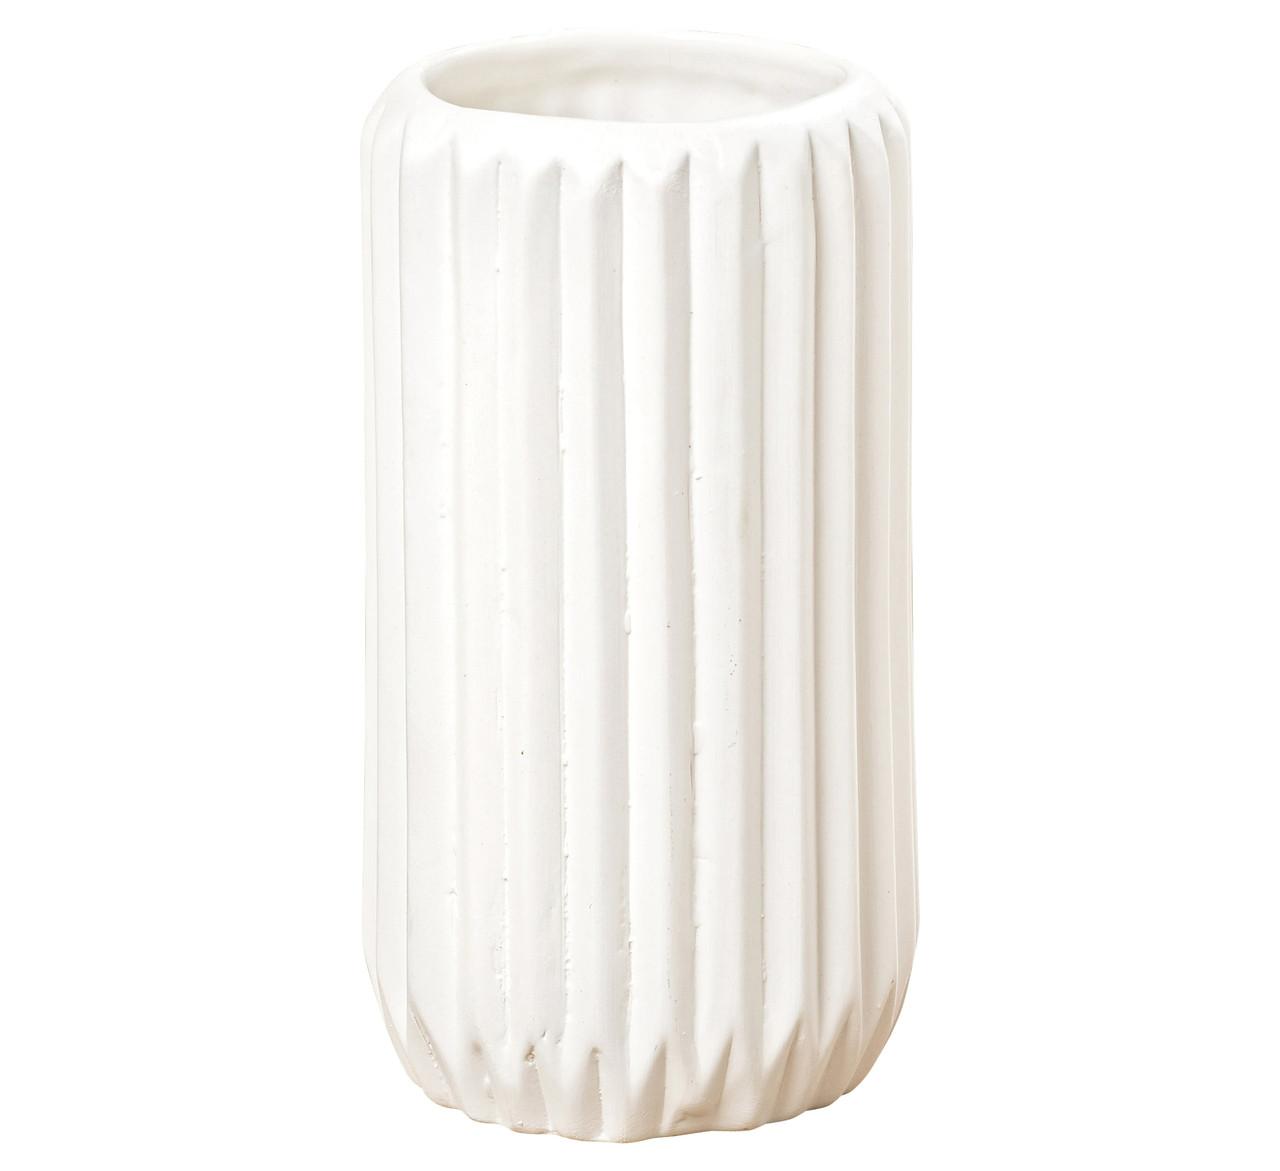 Ваза Эско широкое горлышко белая керамика h17см Гранд Презент 5549600-1 широк